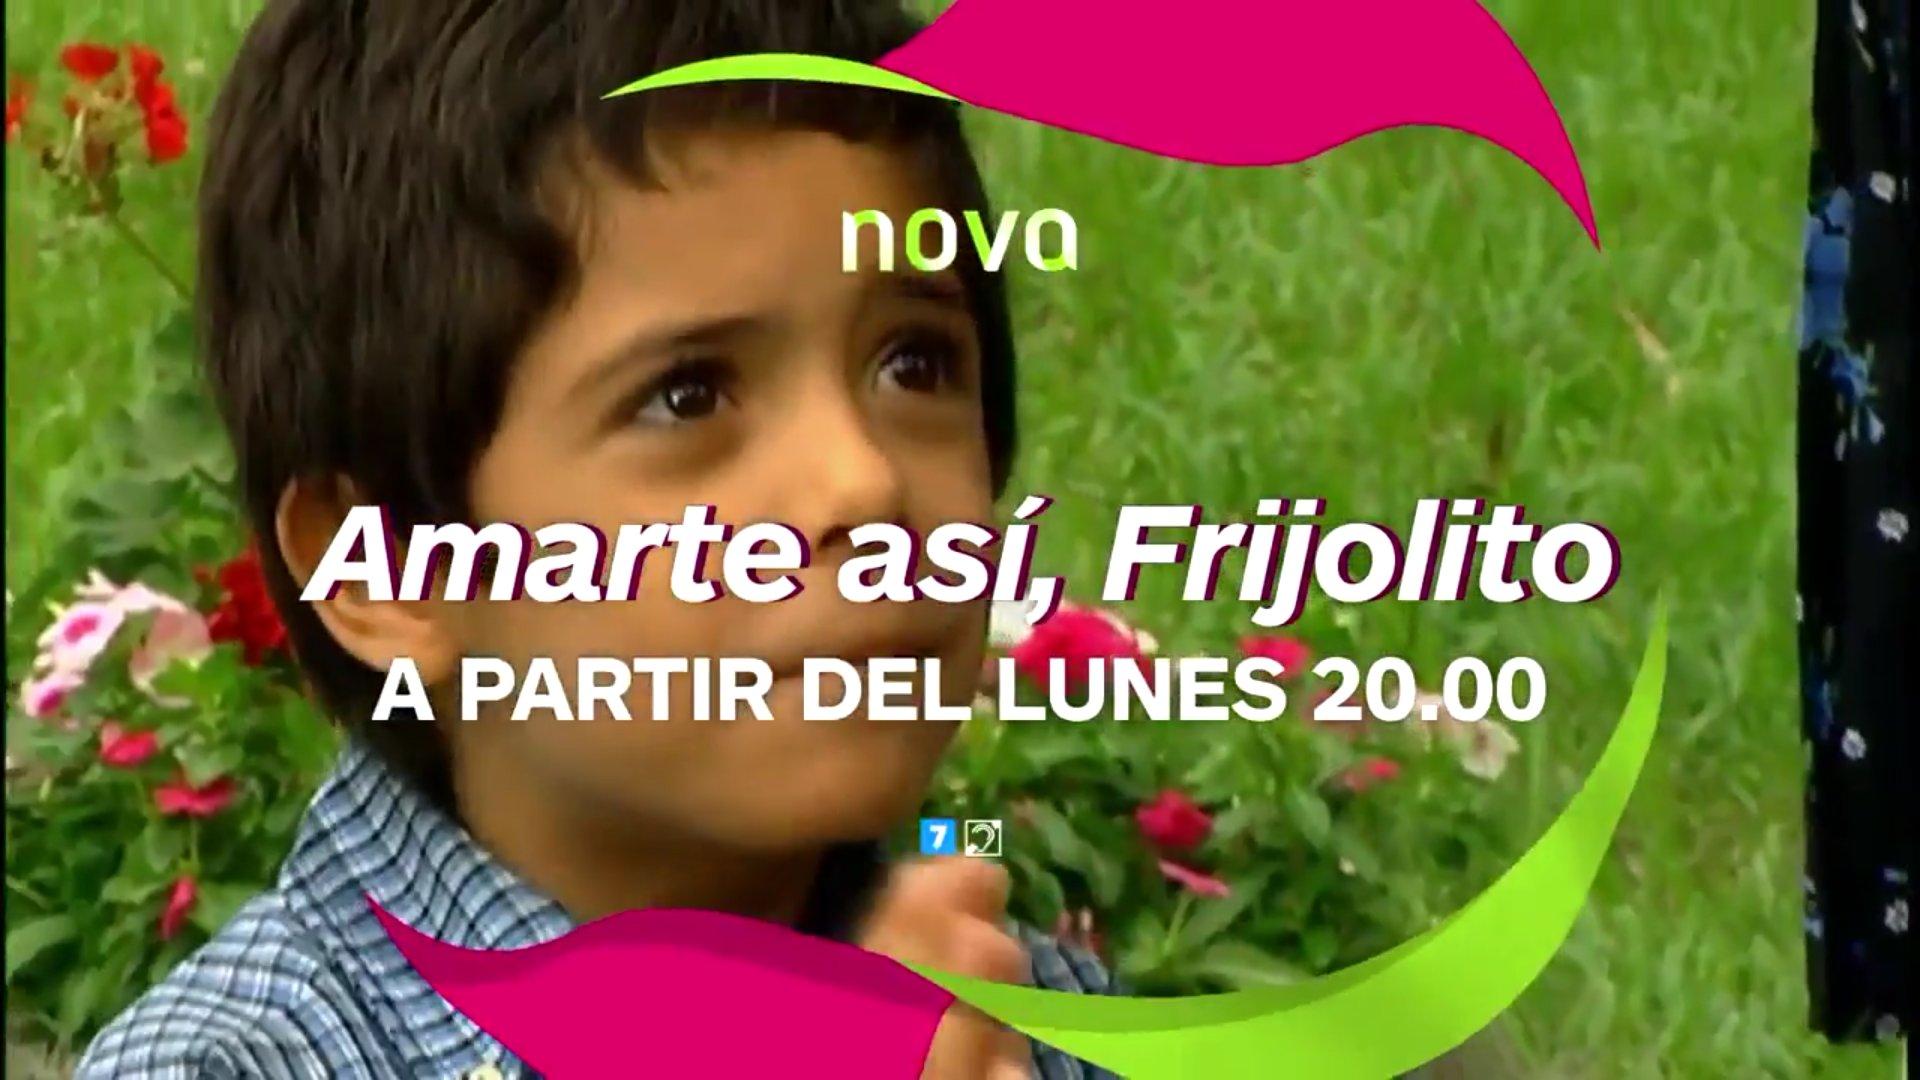 #AmarteAsíFrijolito , el Lunes 4 de Septiembre a las 20.00H  ~GRAN REGRESO~ en @NovaTDT (España). !Regresa un éxito! @LitzyOficial https://t.co/XxDRTAtqZc